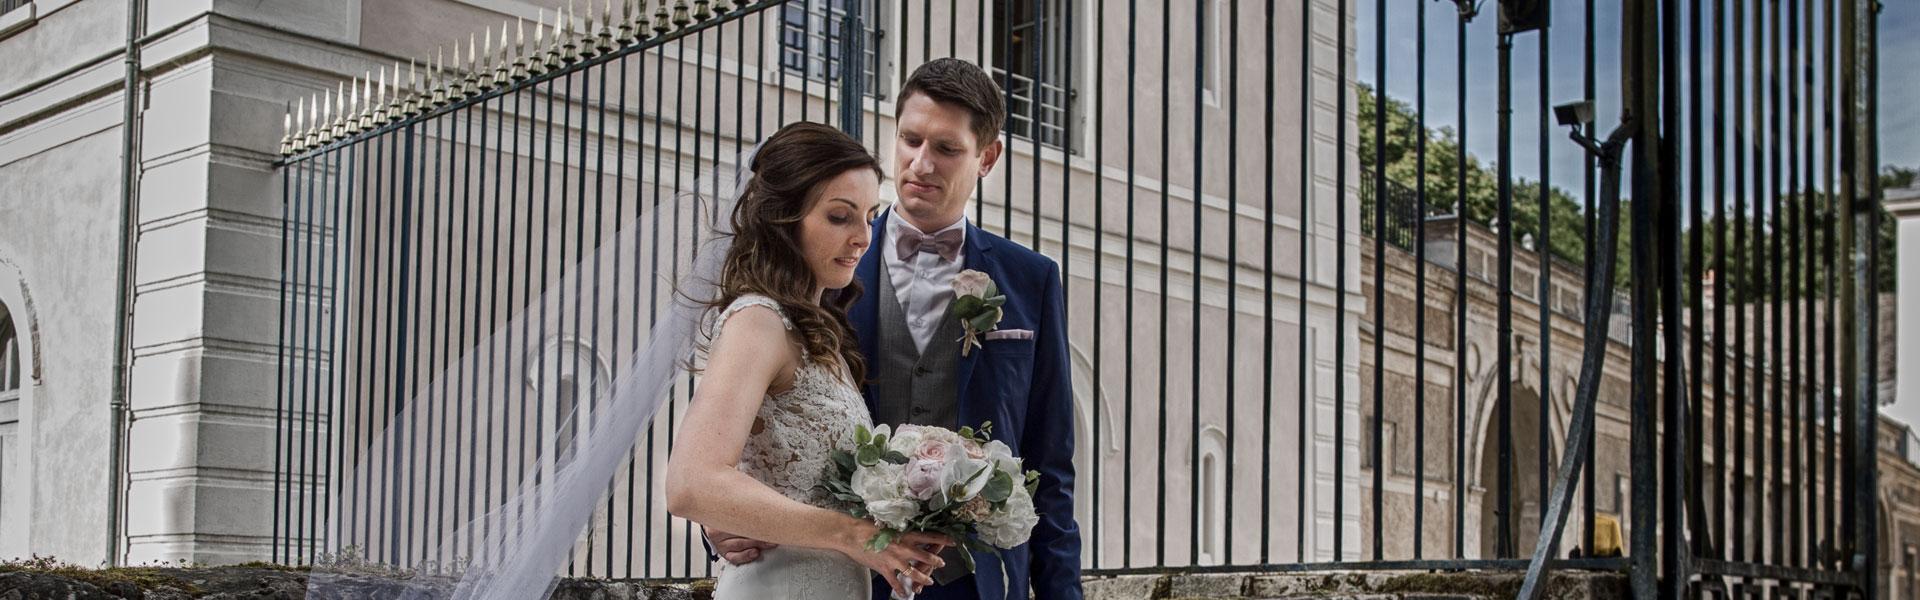 Helen Quentin wedding by wedding video photo